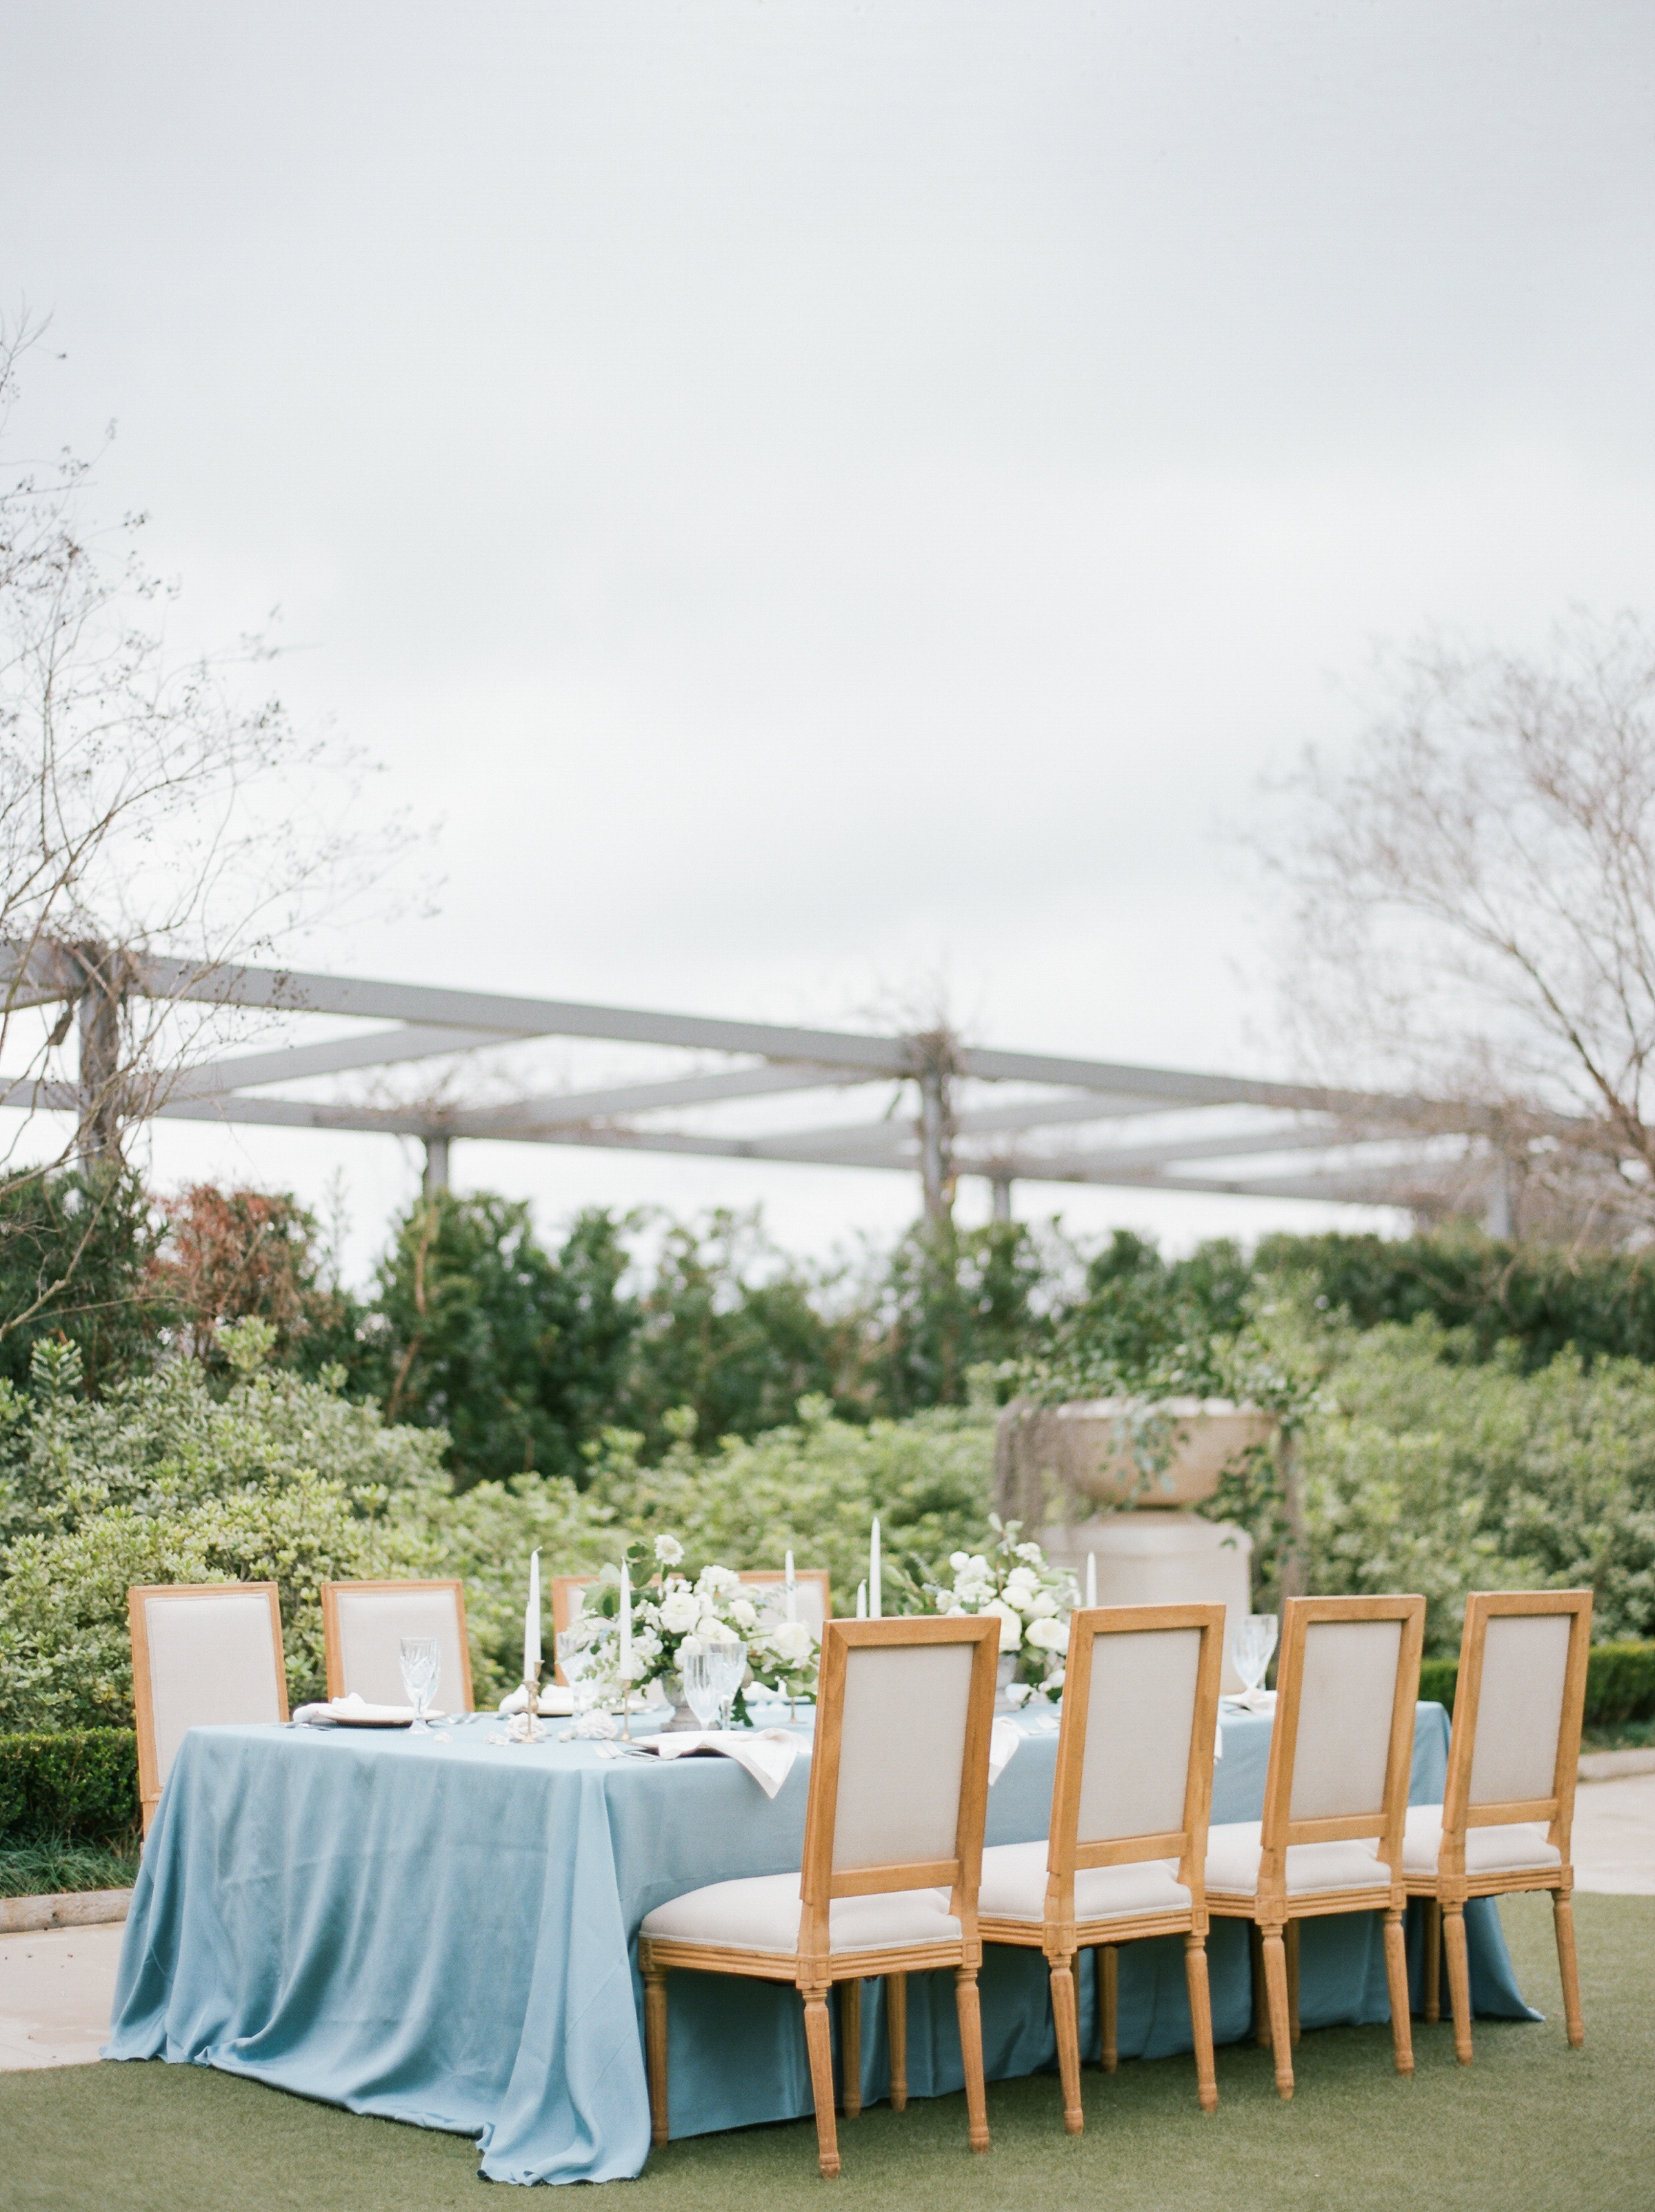 McGovern-Centennial-Gardens-Houston-Texas-Wedding-Venue-Josh-Dana-Fernandez-Photography-Film-Destination-Fine-Art-Luxury-Top-Best-Austin-Dallas-Magnolia-Rouge-Jennifer-Laura-Design-205.jpg